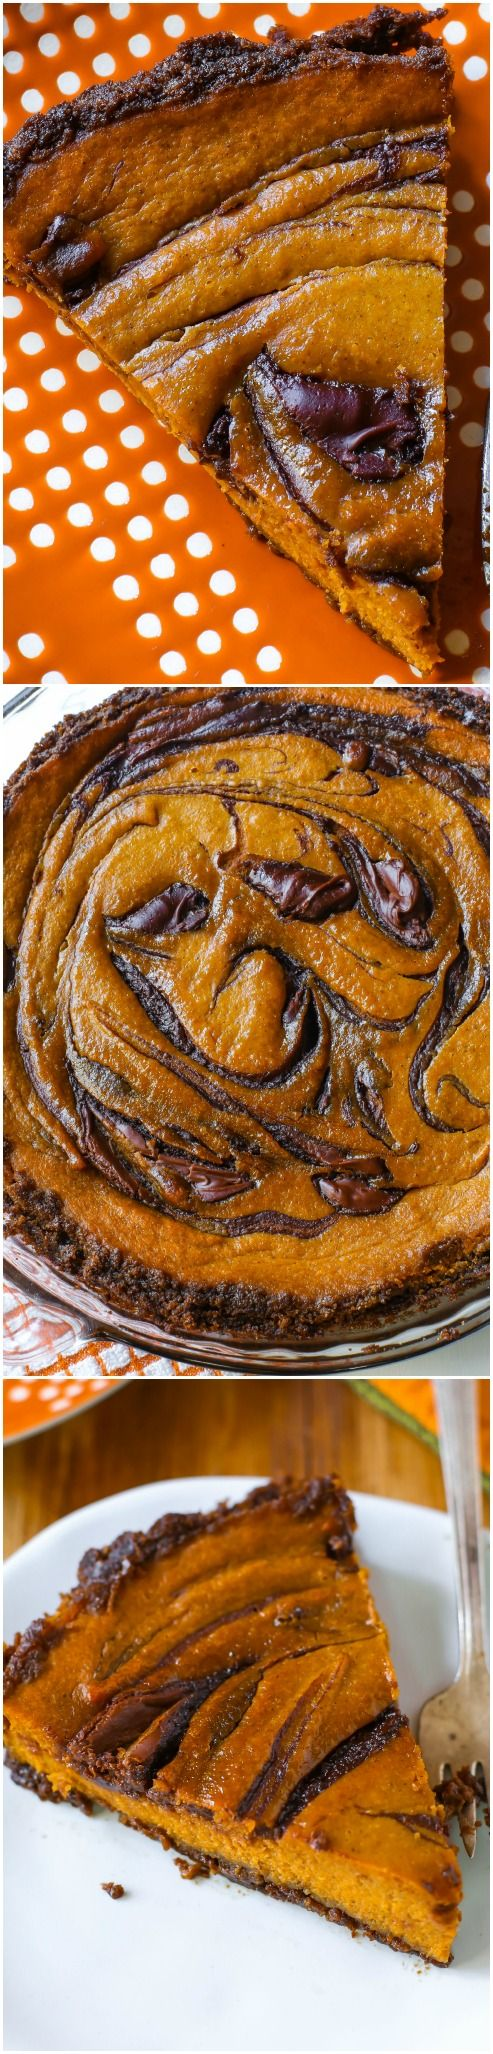 A twist on traditional pumpkin pie swirled with decadent for Pumpkin pie with a twist